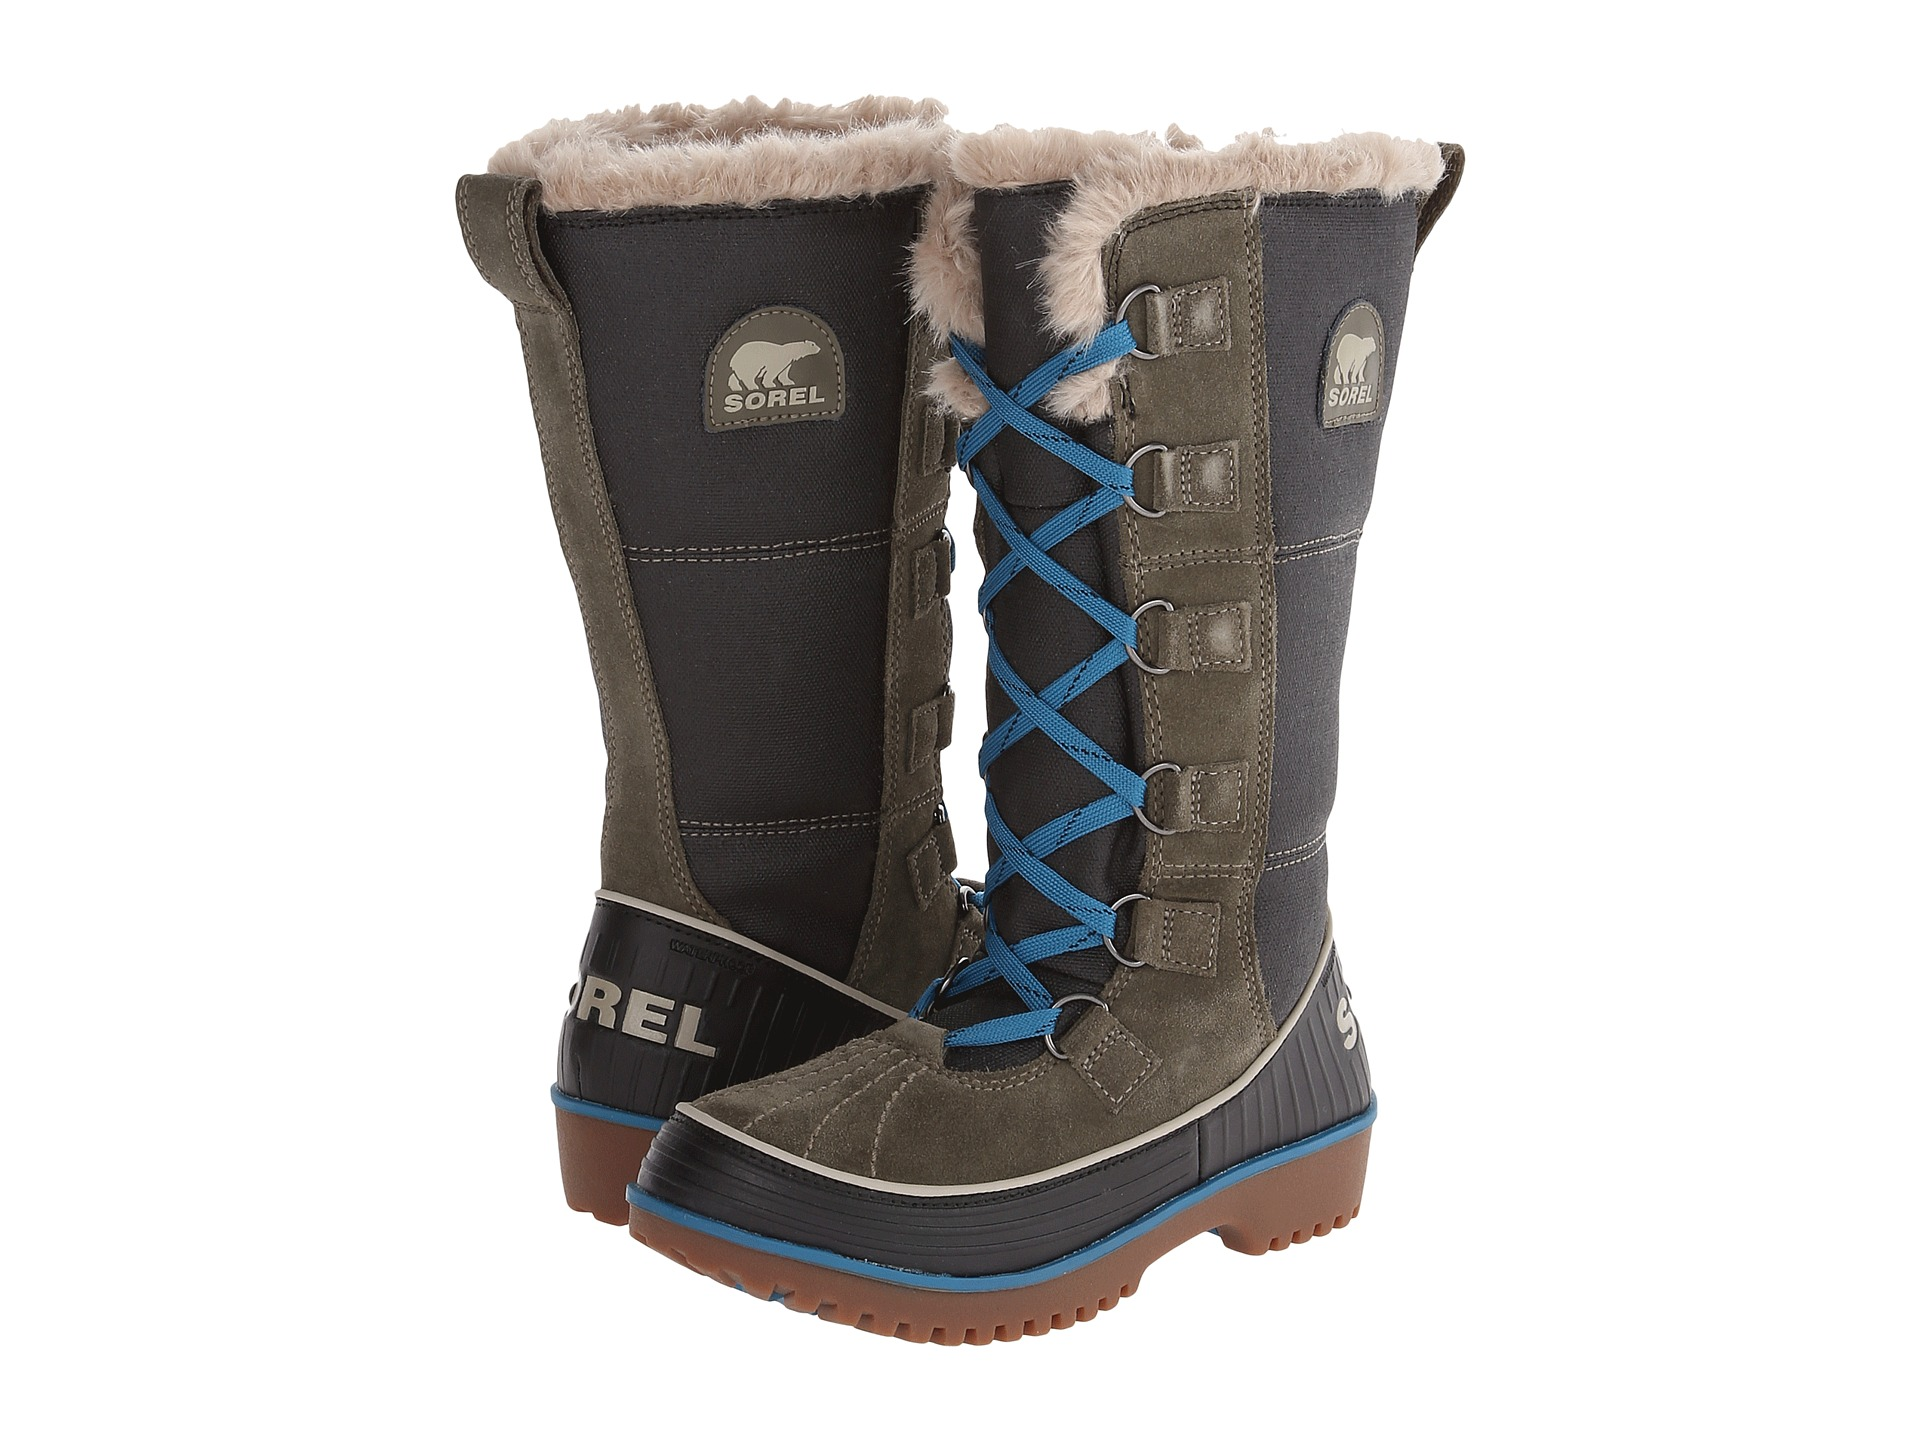 Sorel Women S Tivoli High Ii Winter Boots